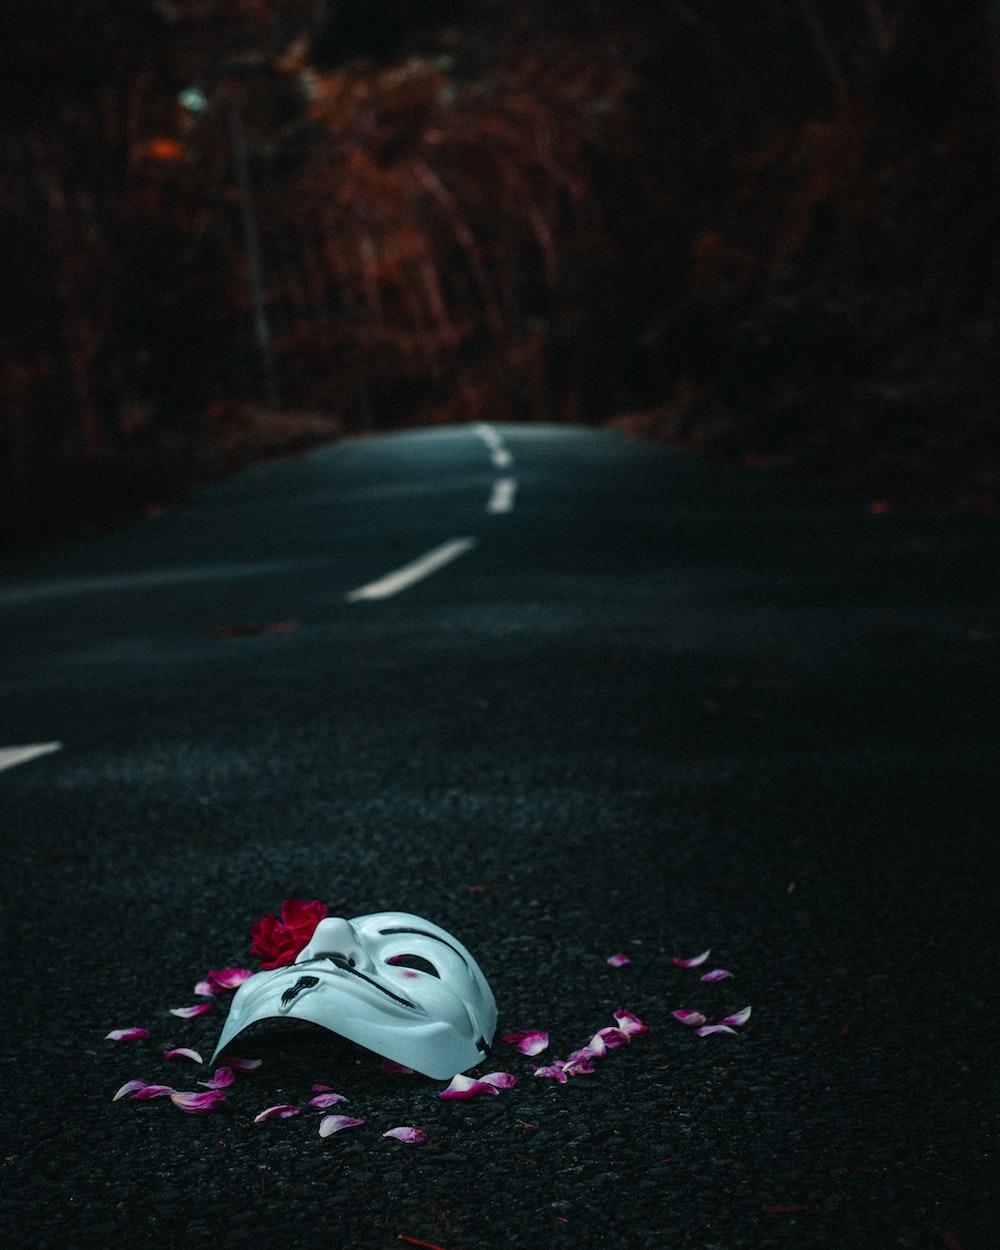 white and pink air jordan shoes on black asphalt road